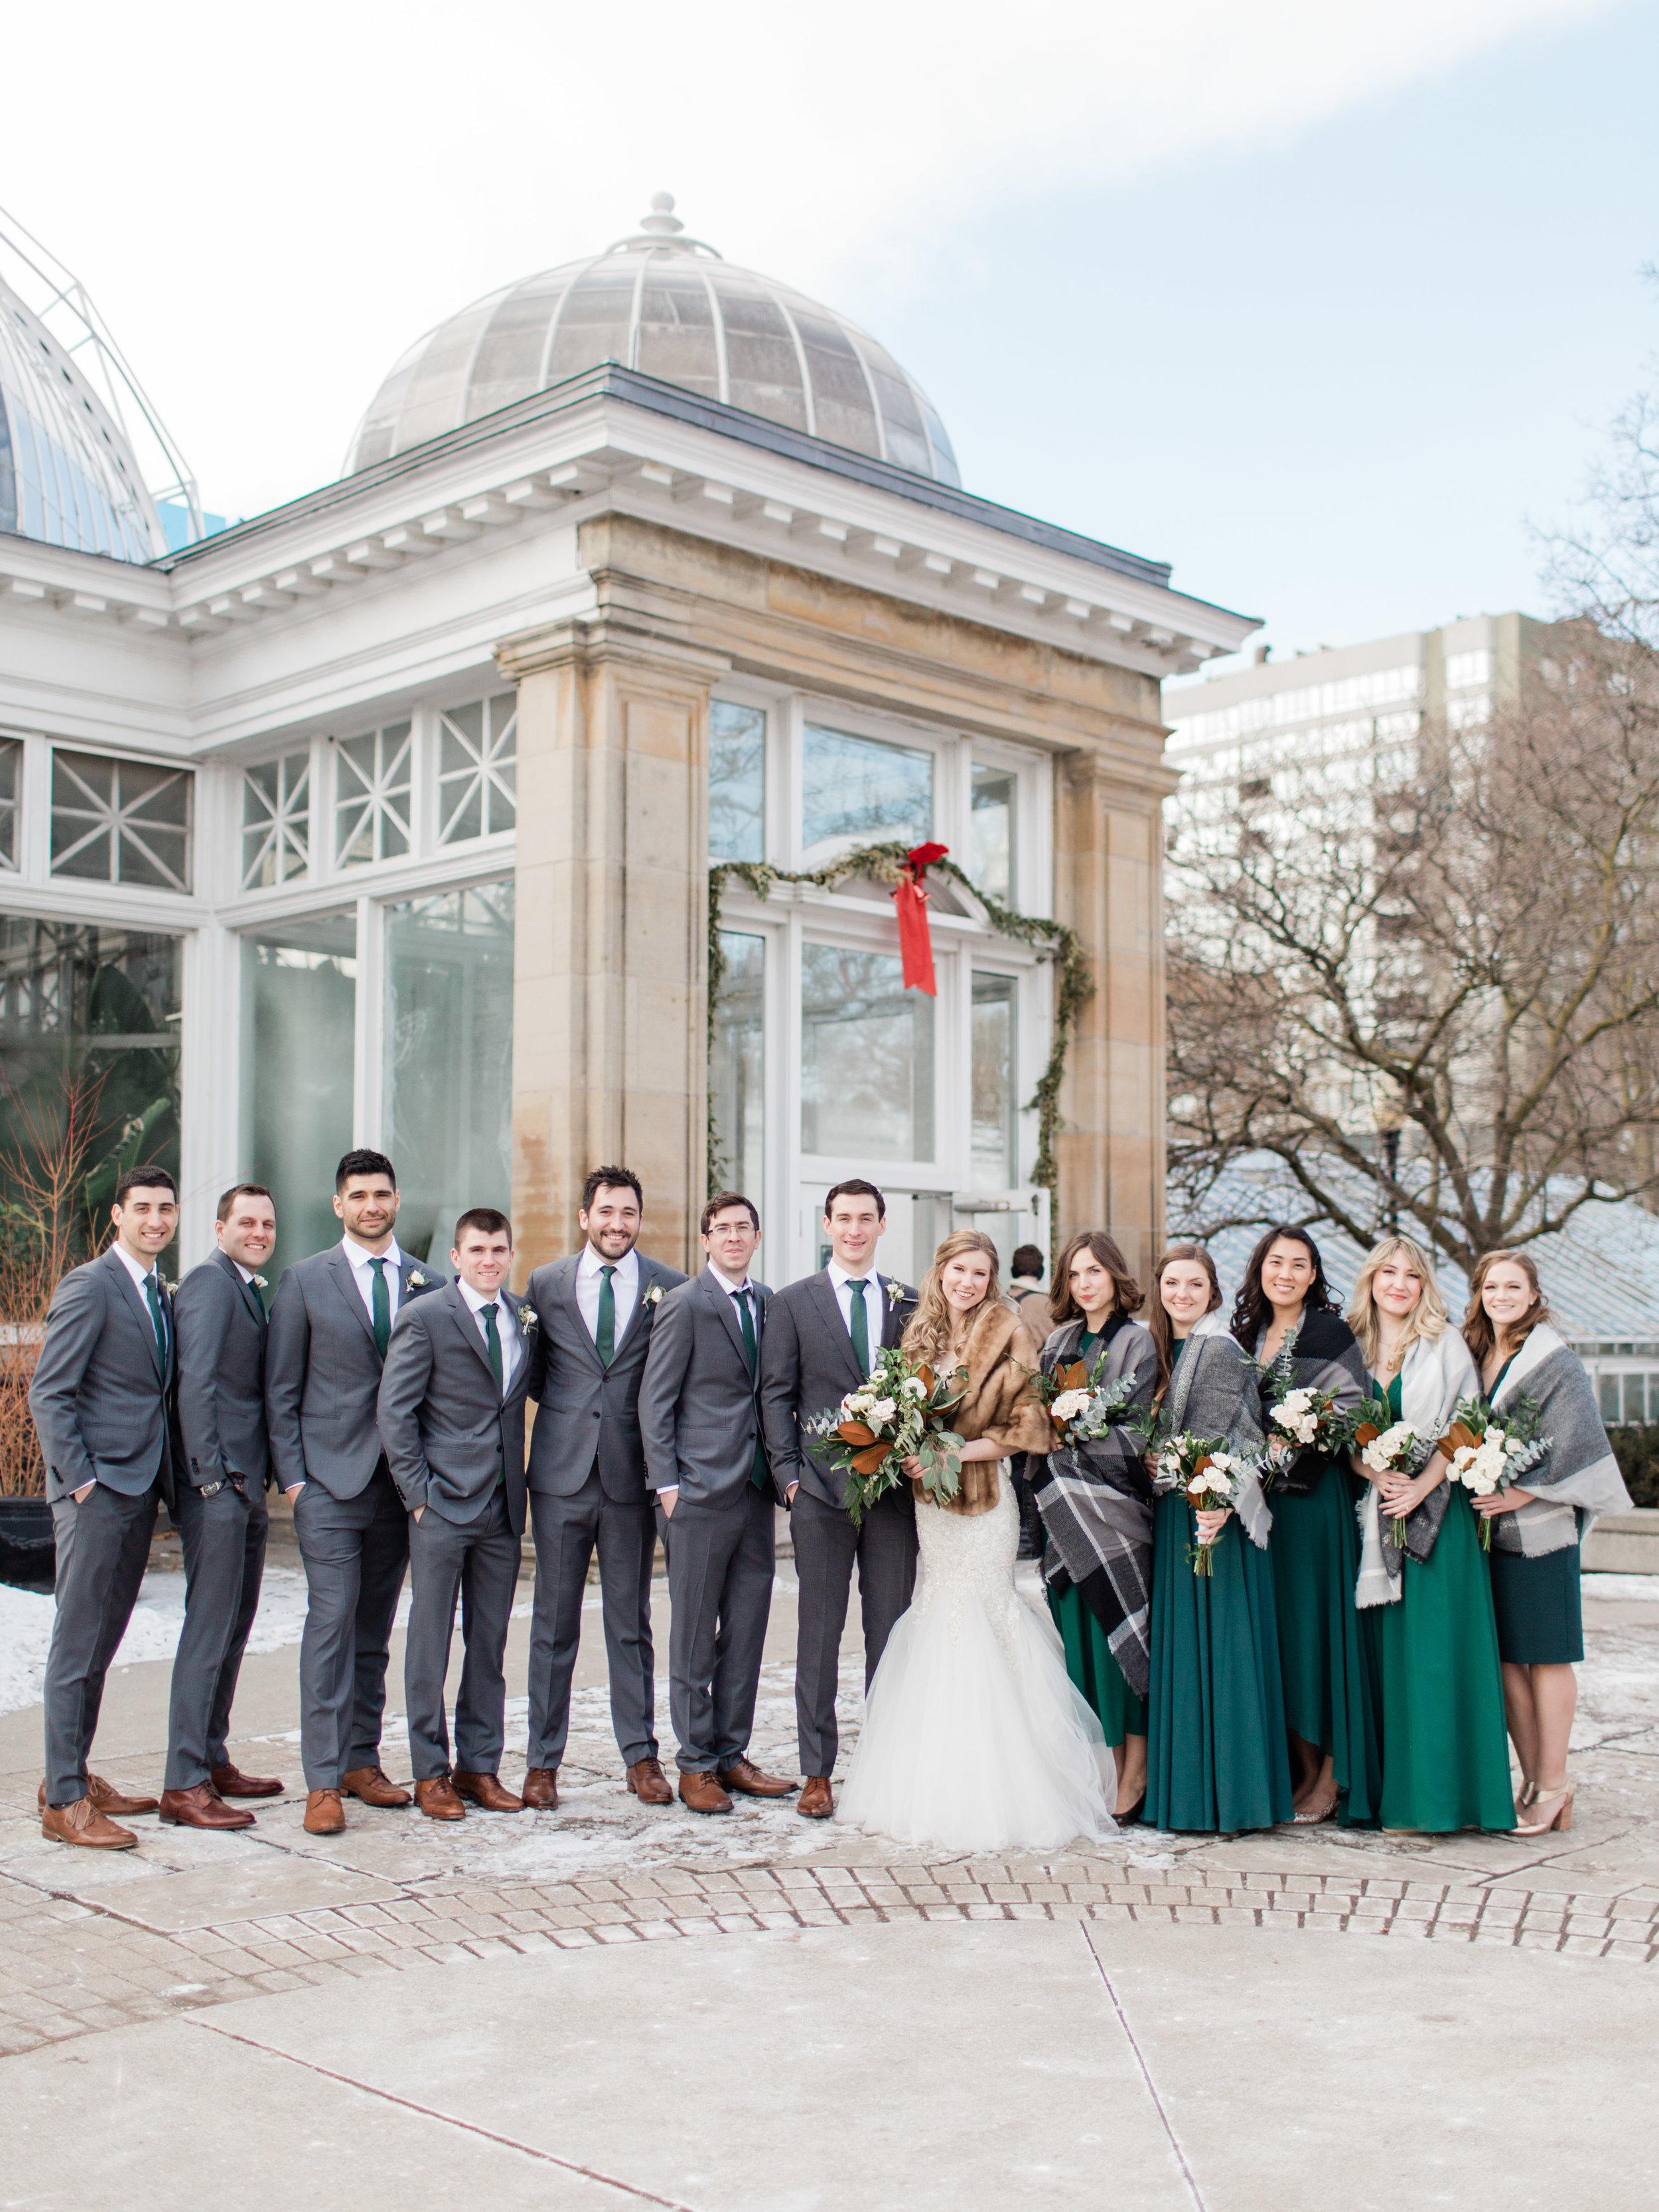 Toronto-wedding-photographer-downtown-winter-wedding-intimate-restaurant-canoe49.jpg